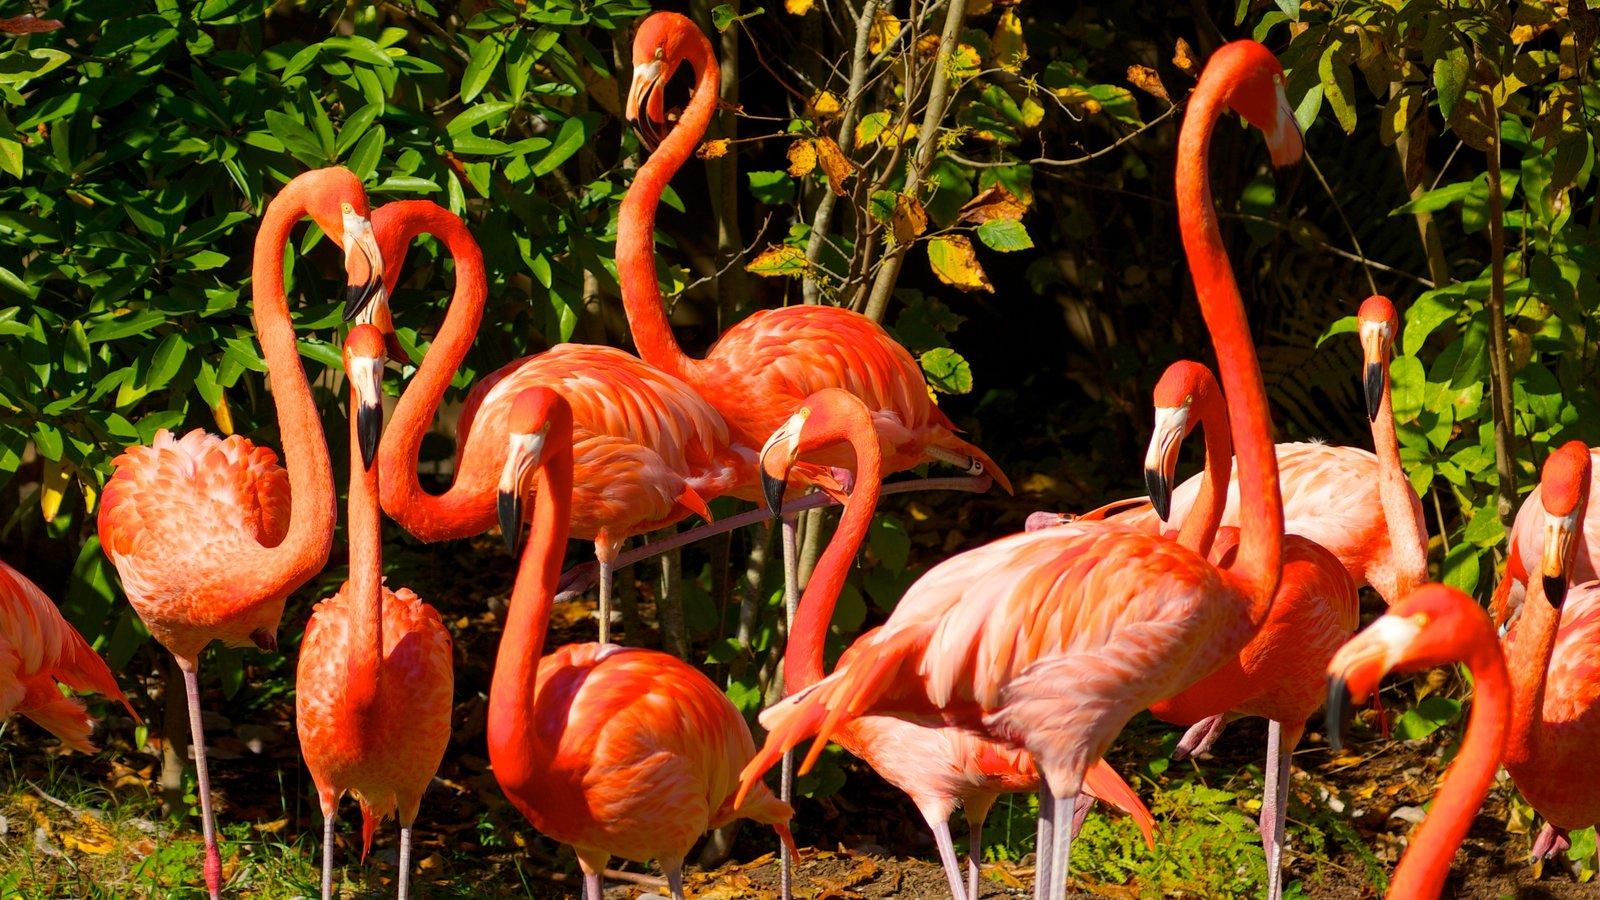 Nashville Zoo featuring bird life and zoo animals